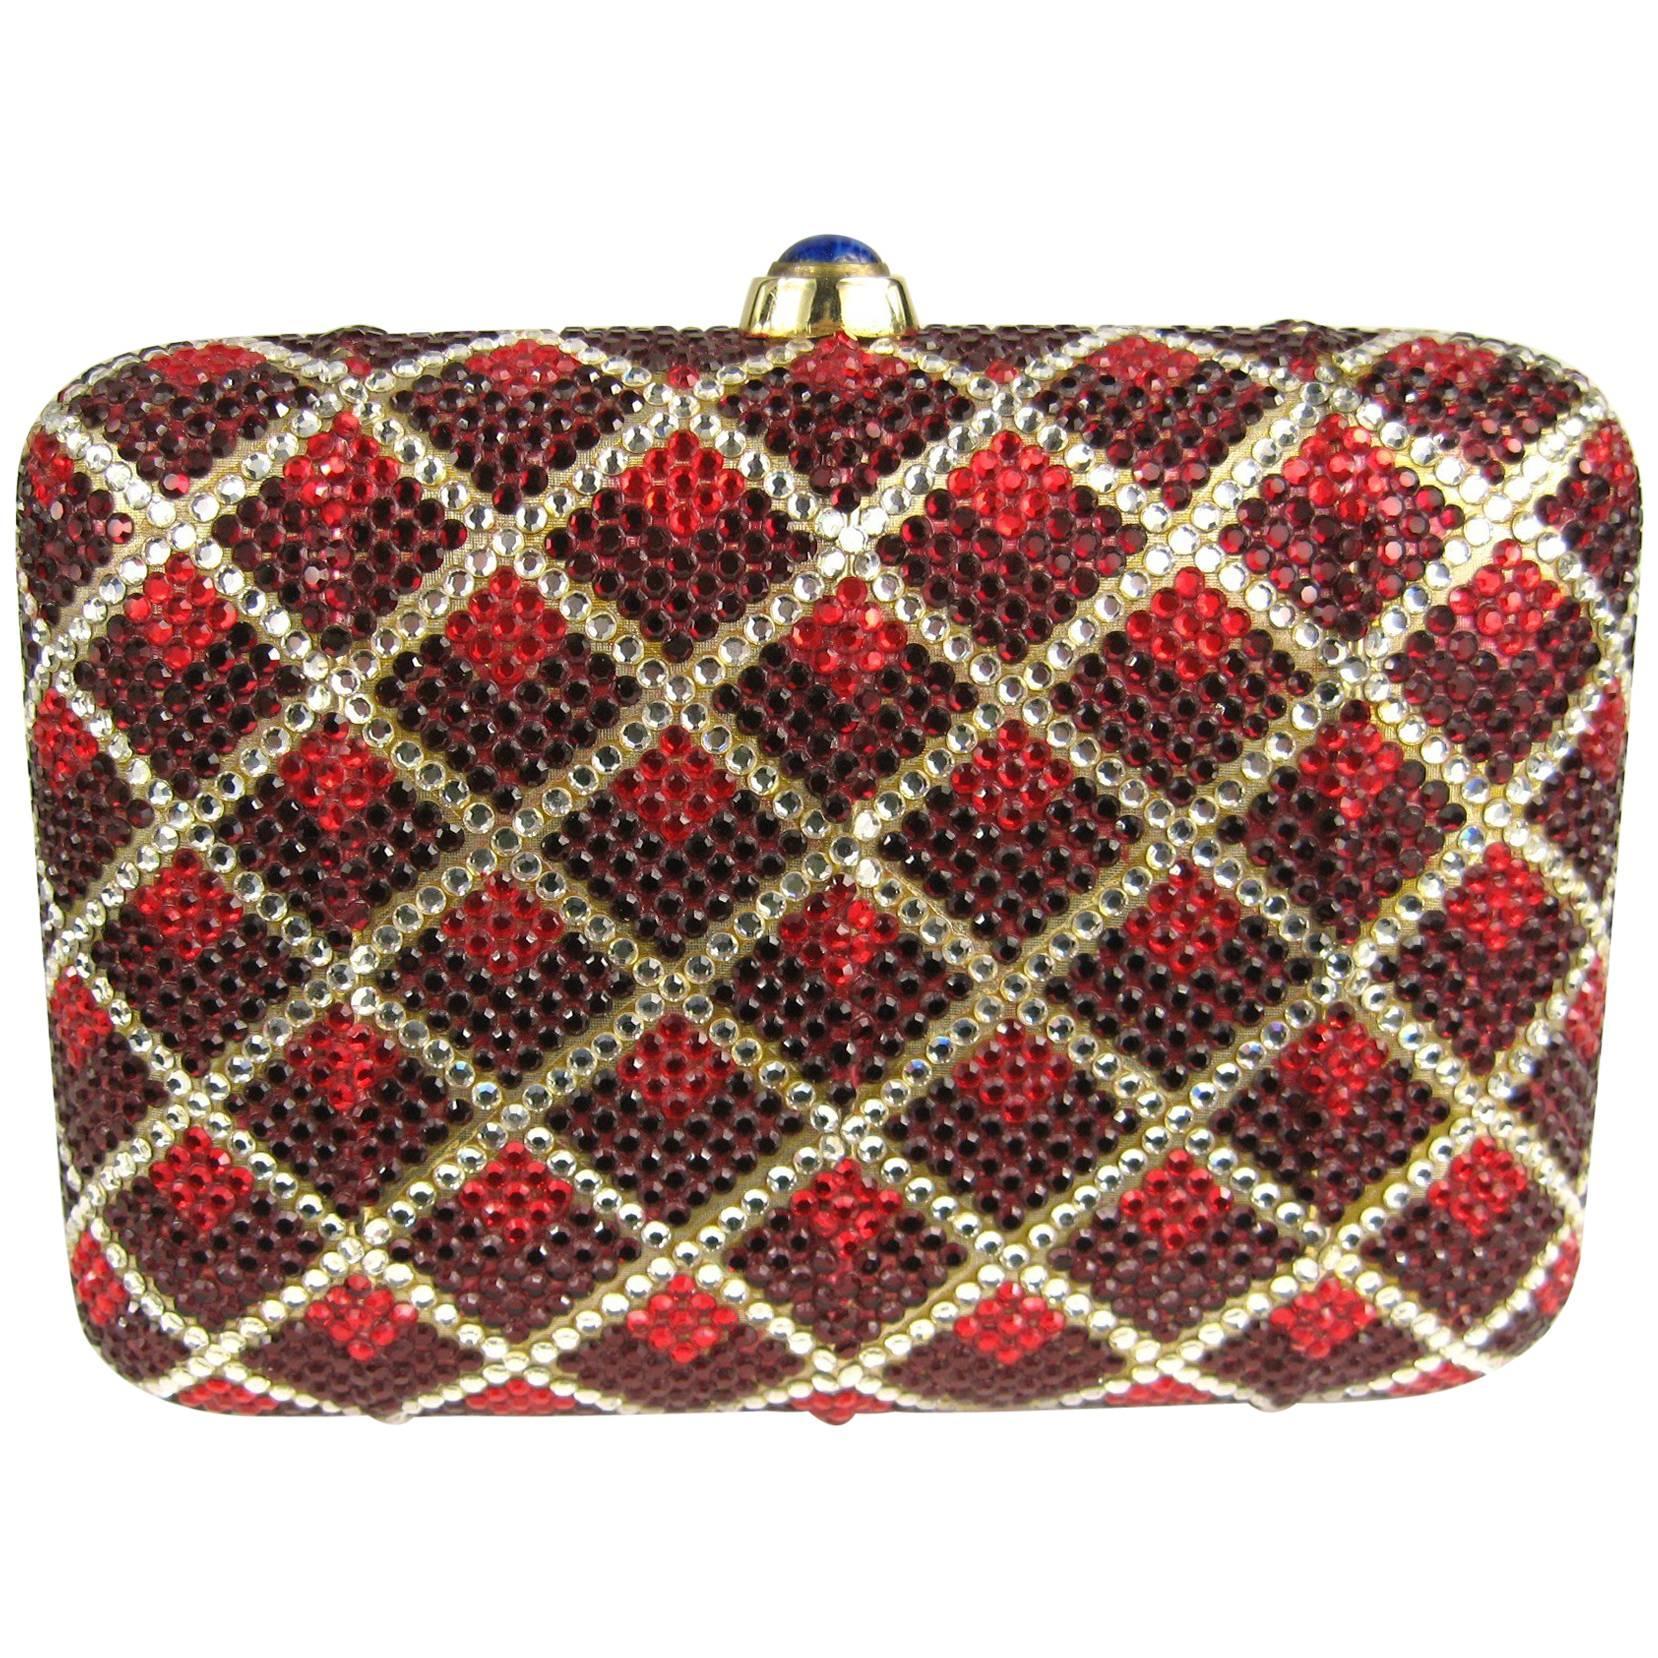 Judith Leiber Red Swarovski Crystal Minaudiere Evening Bag Clutch Holiday Runway